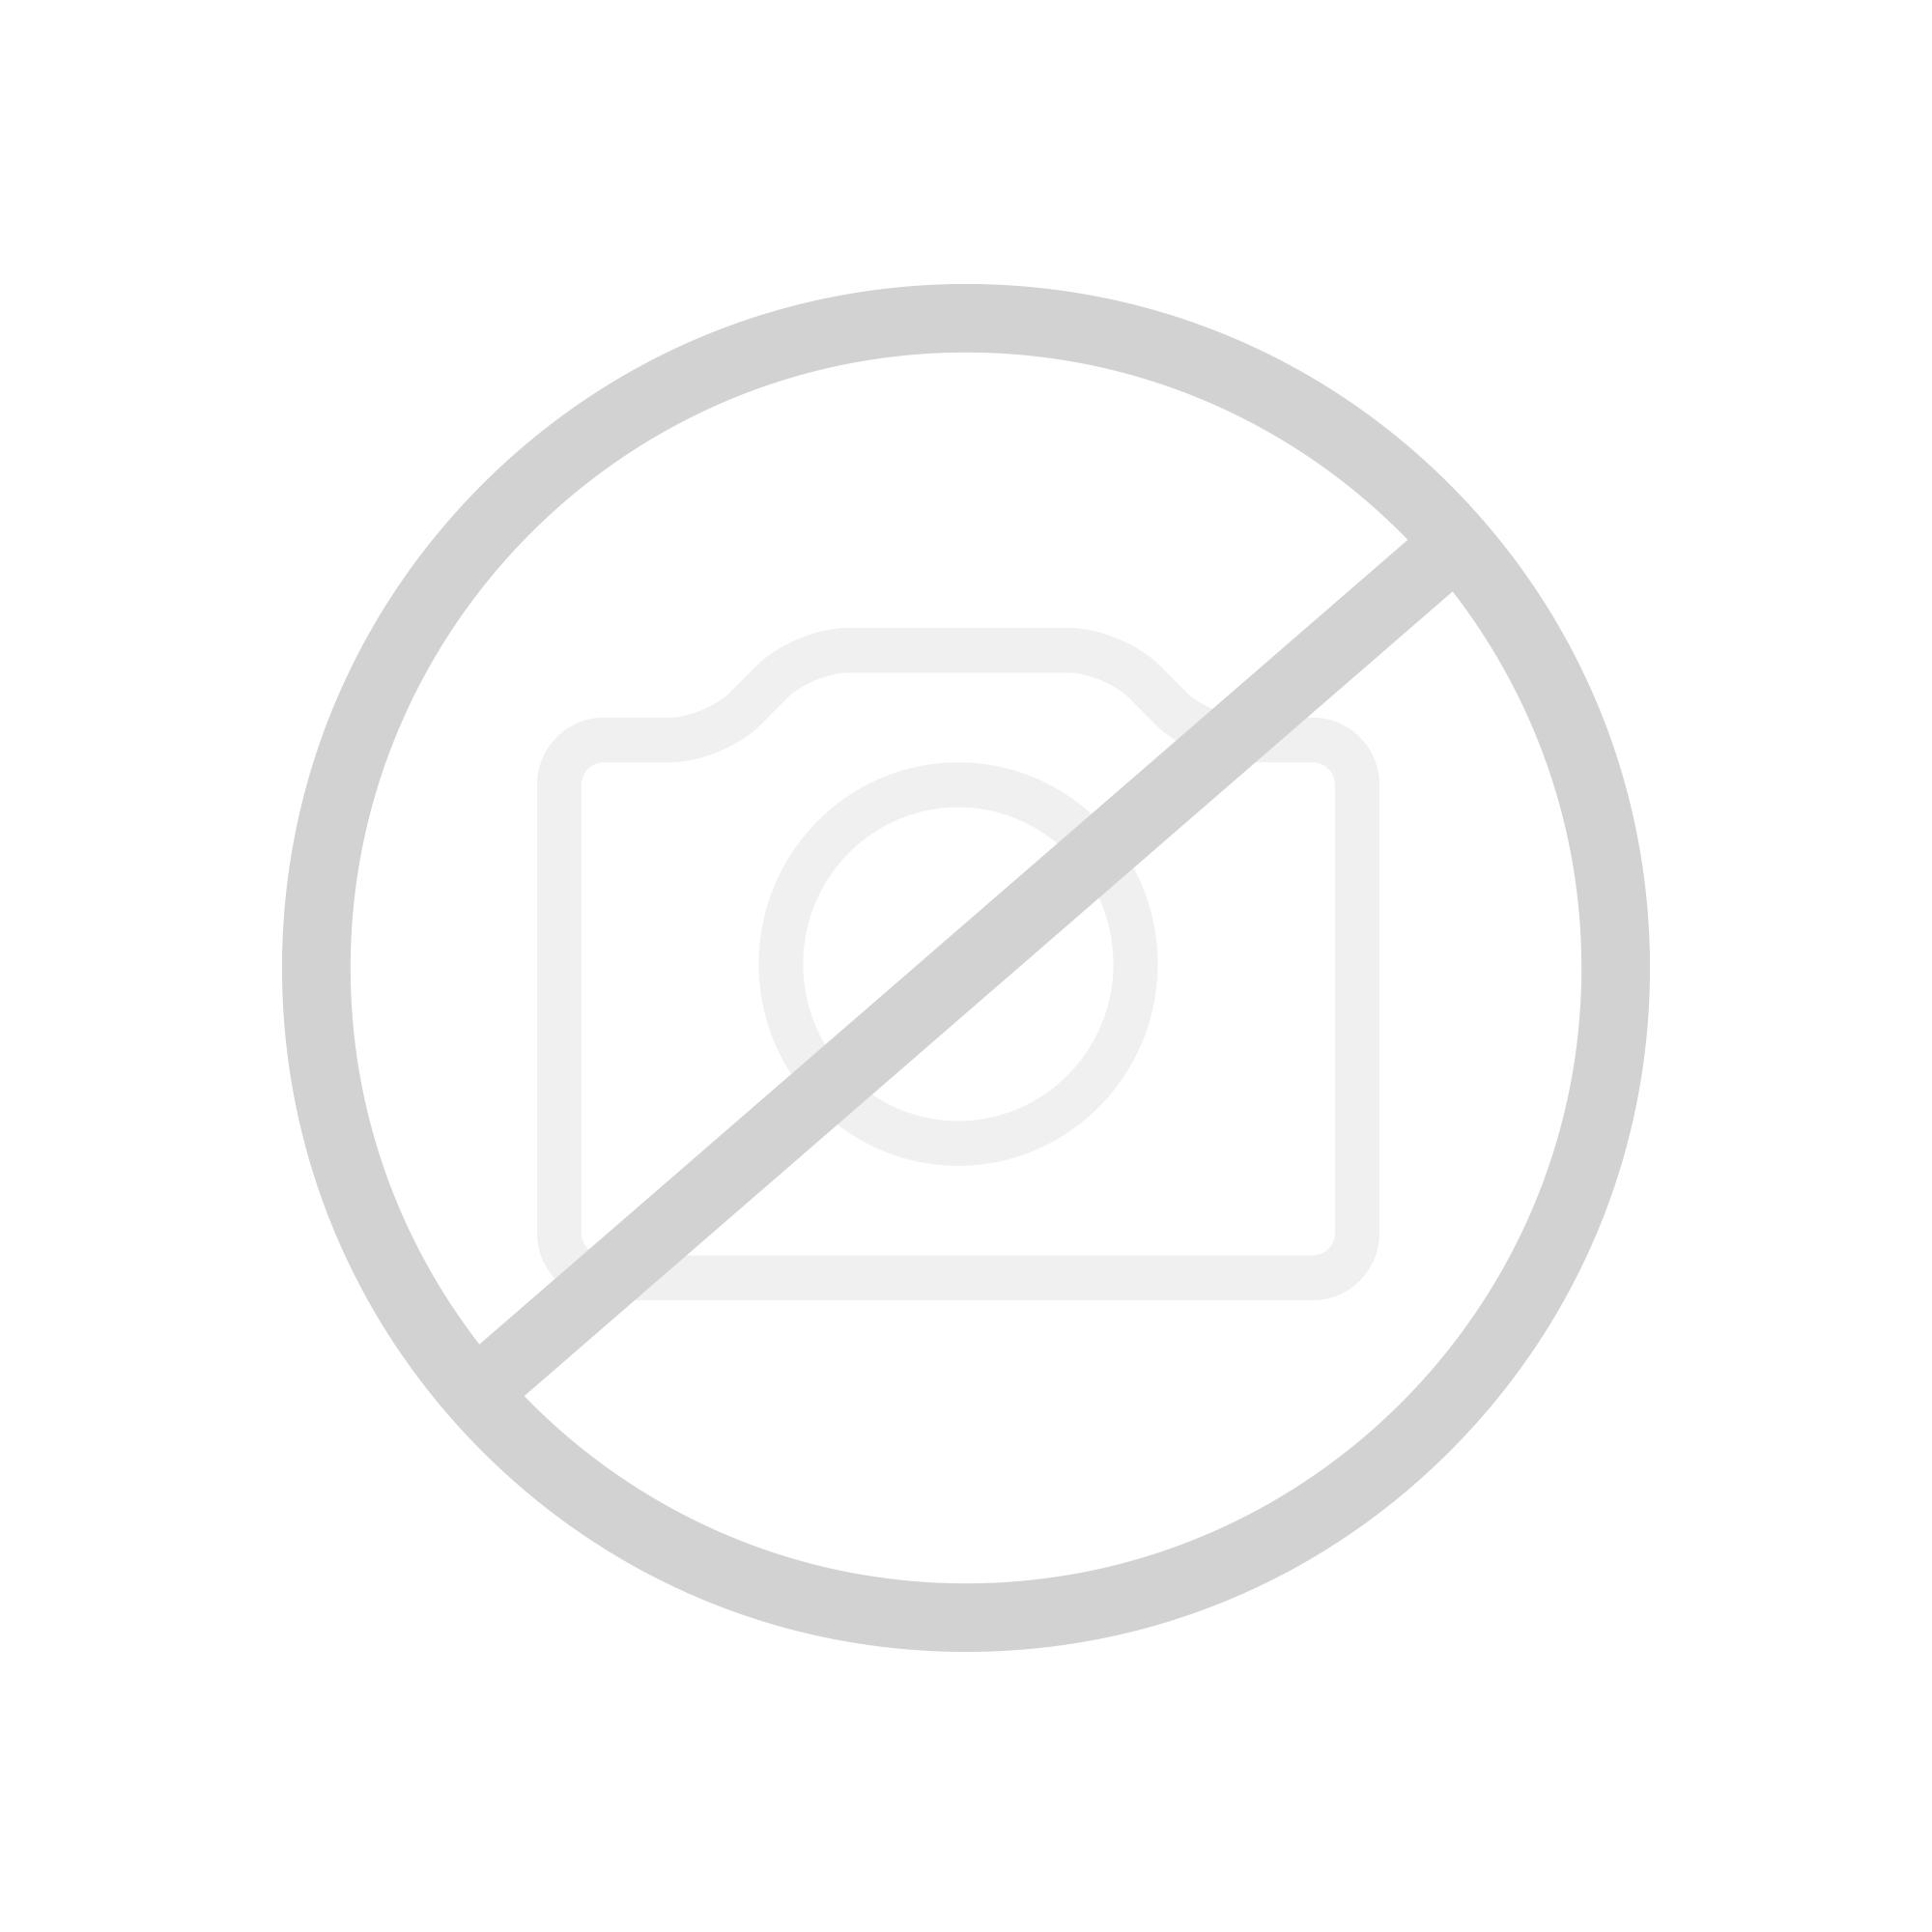 HSK ASP 300 Spiegelschrank   1102060S   Reuter Onlineshop